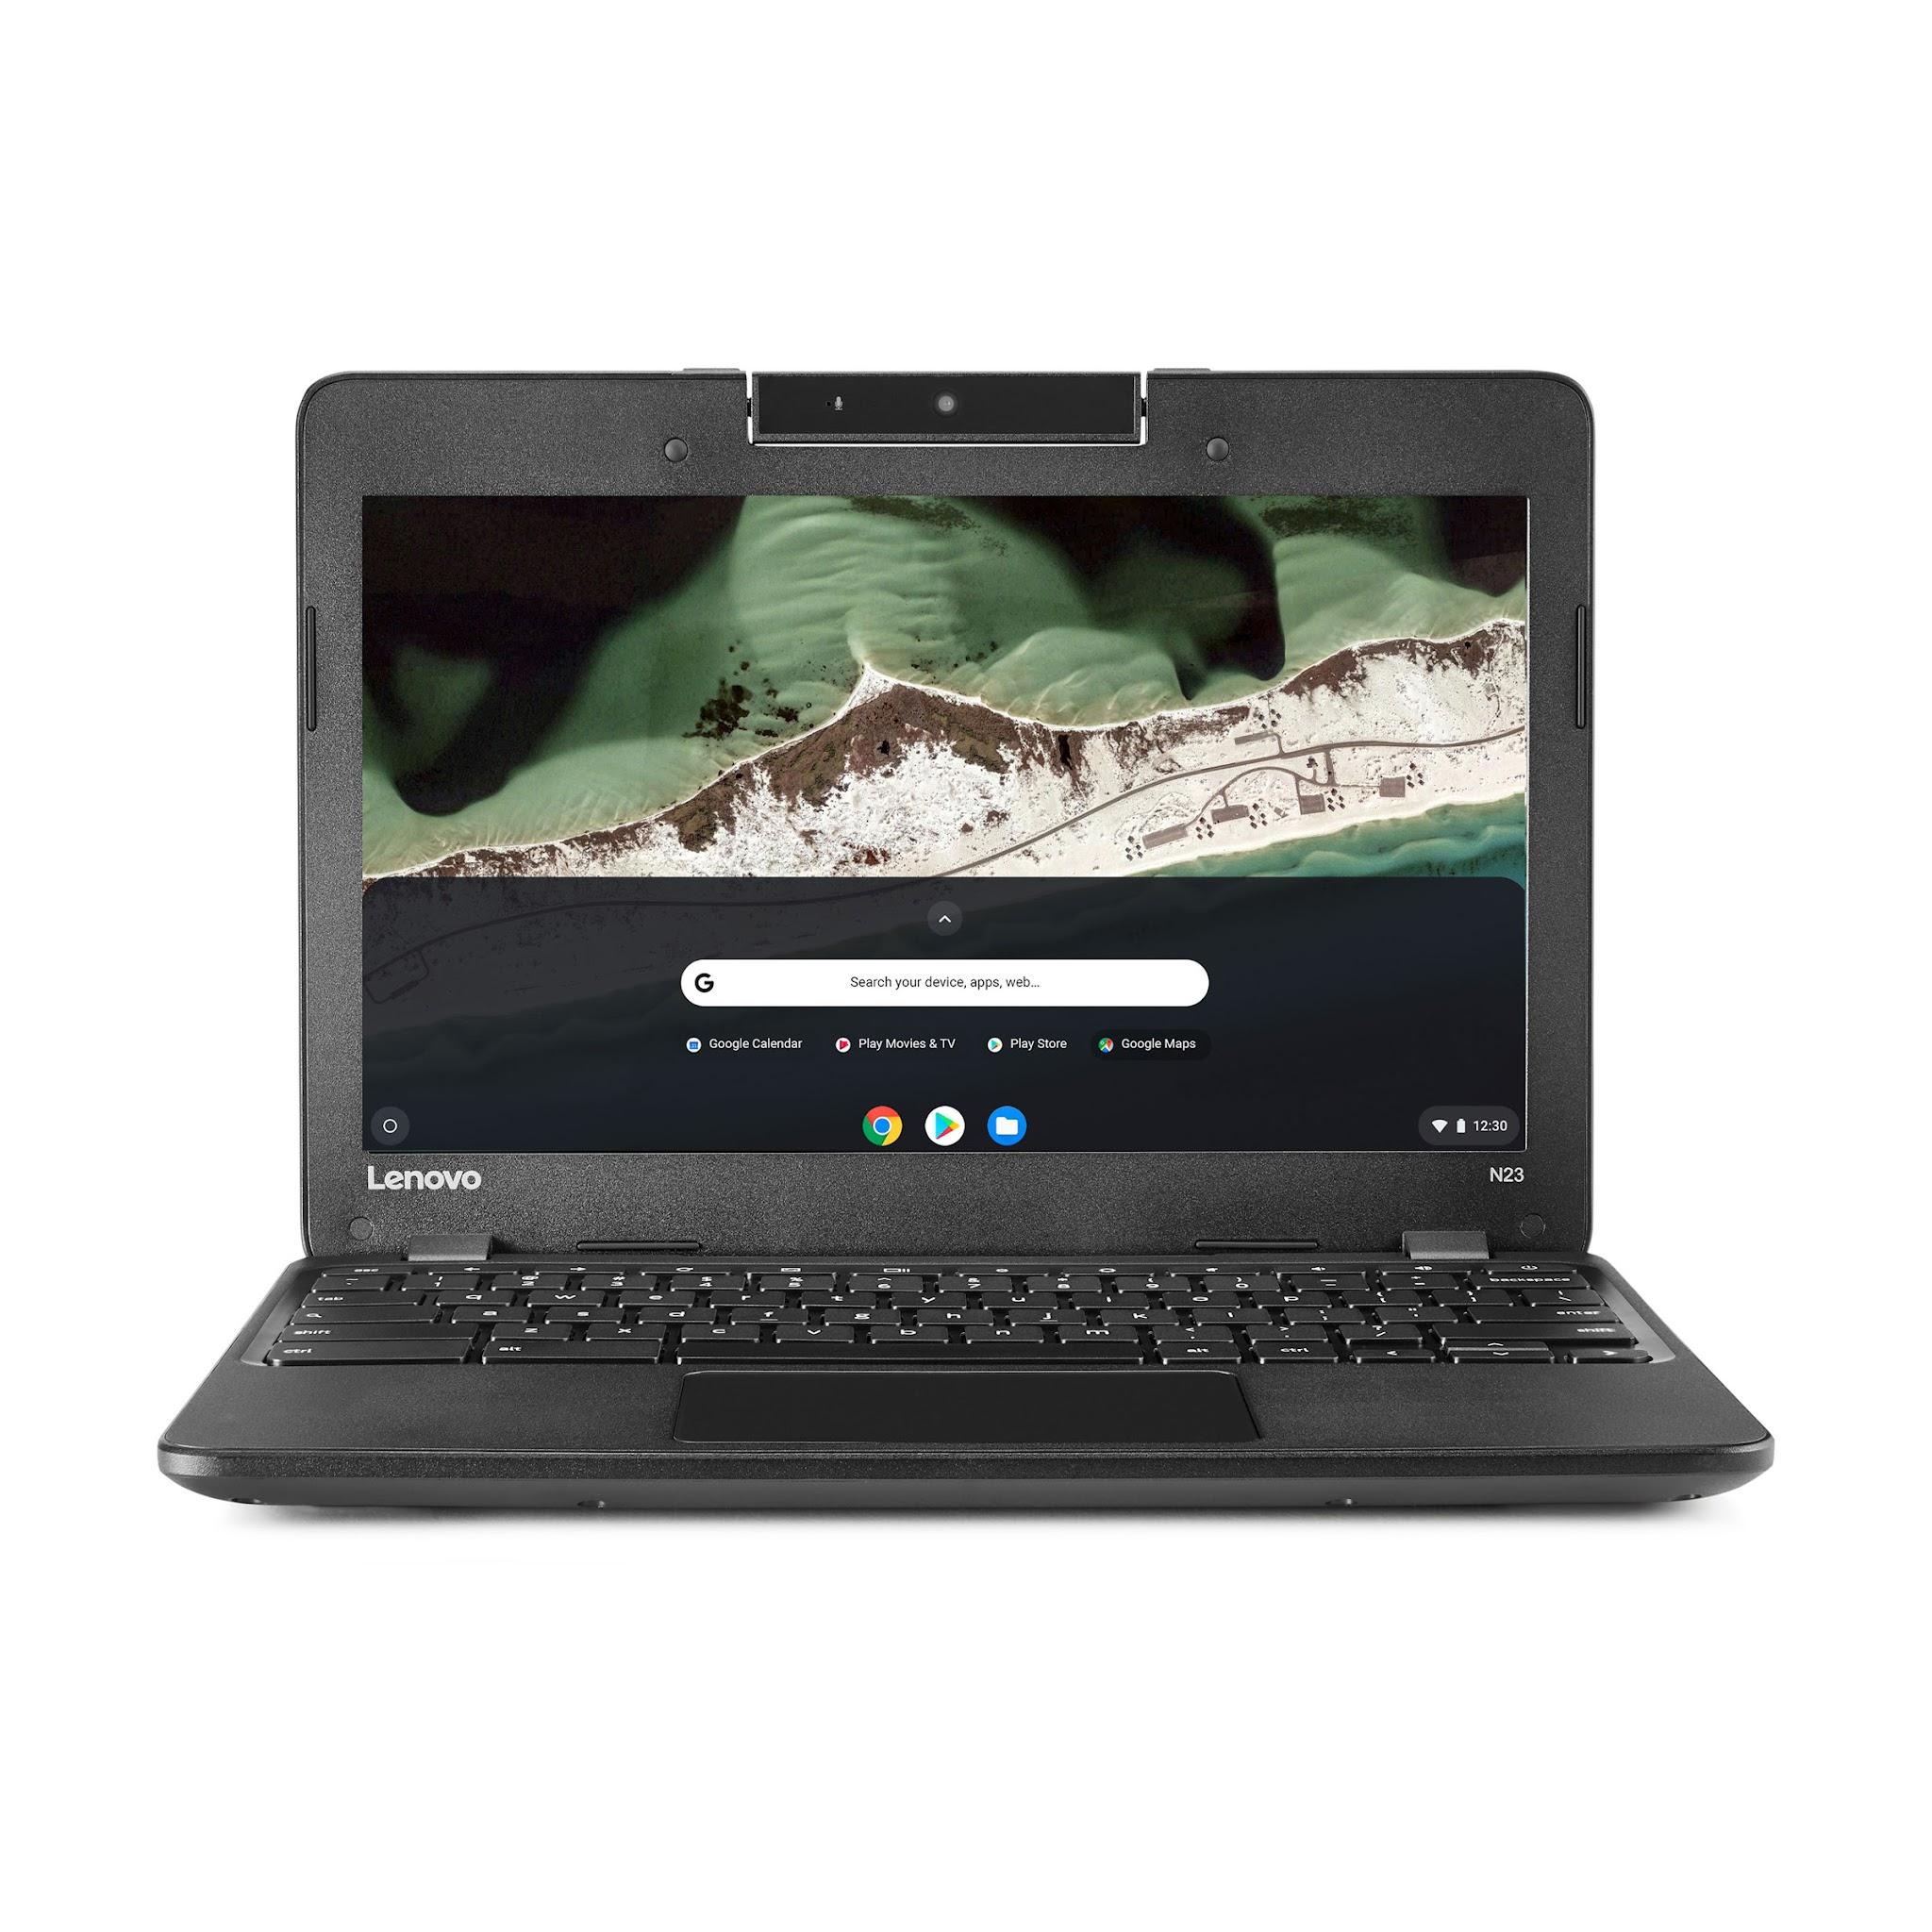 Lenovo N23 Chromebook - photo 1